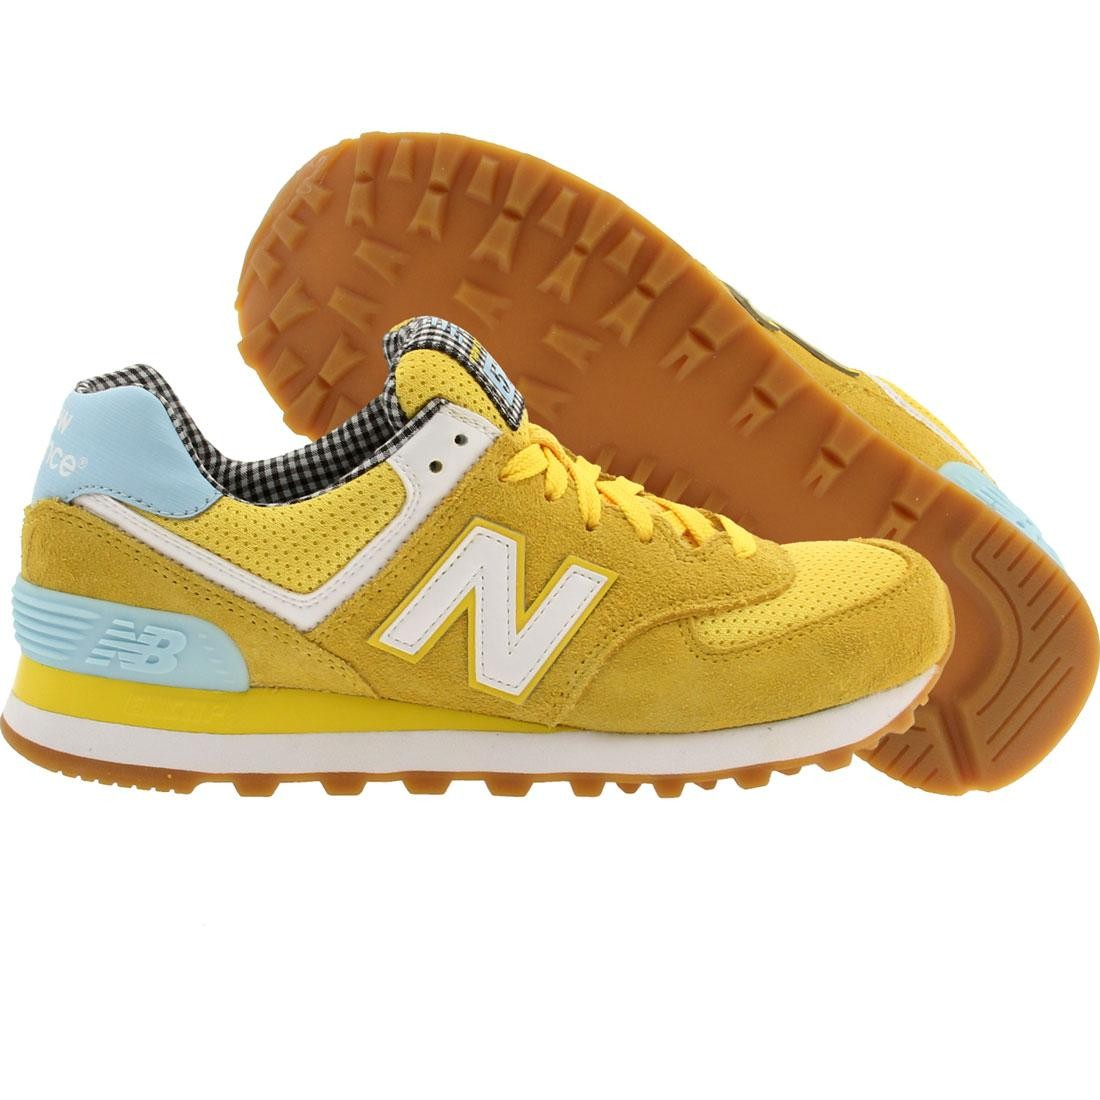 wholesale dealer 59a49 8d716 classic new balance 574 yellow new balance kl574 sale